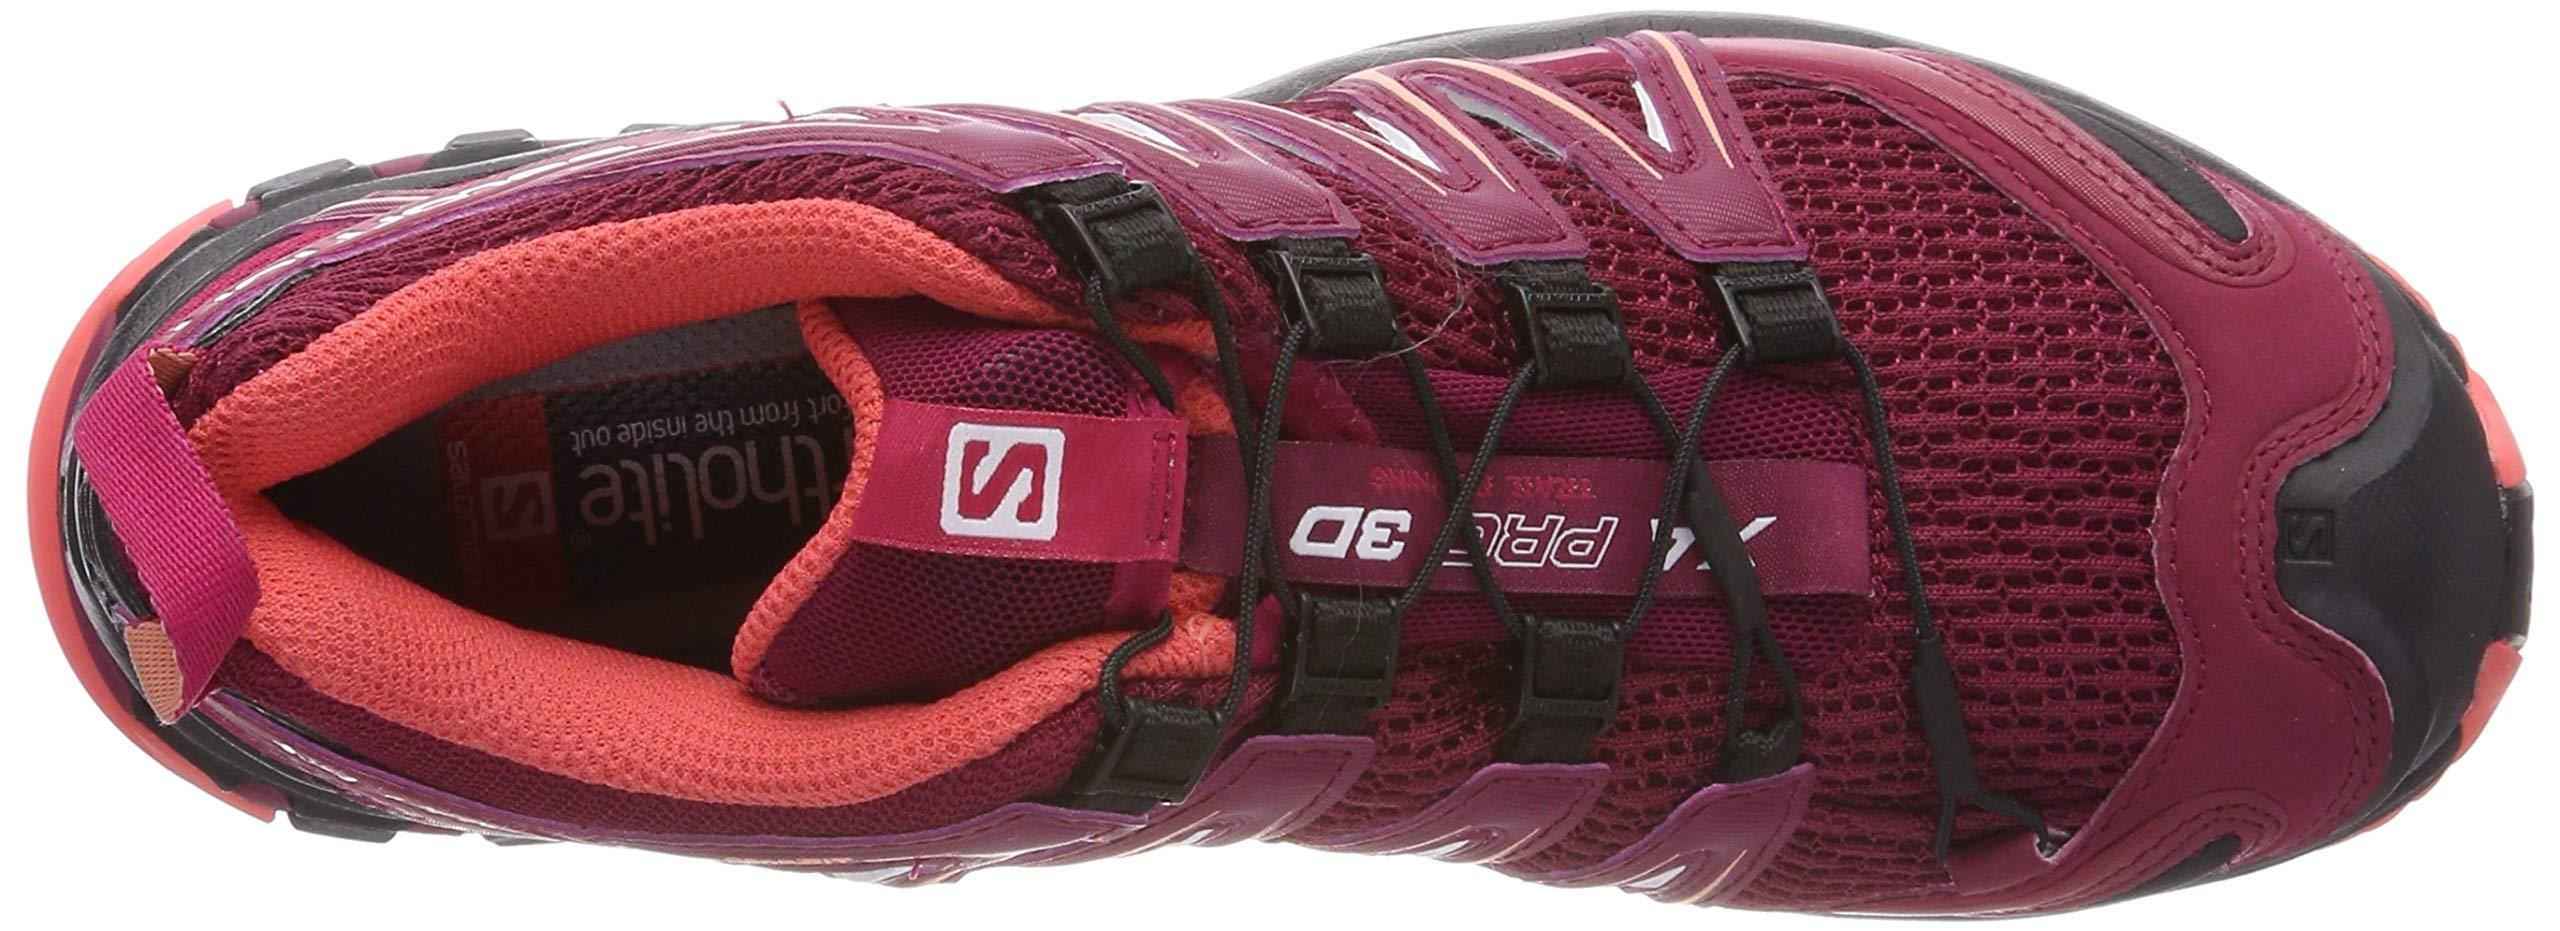 810zXaS3A1L - SALOMON Women's Xa Pro 3D W Trail Running Shoes